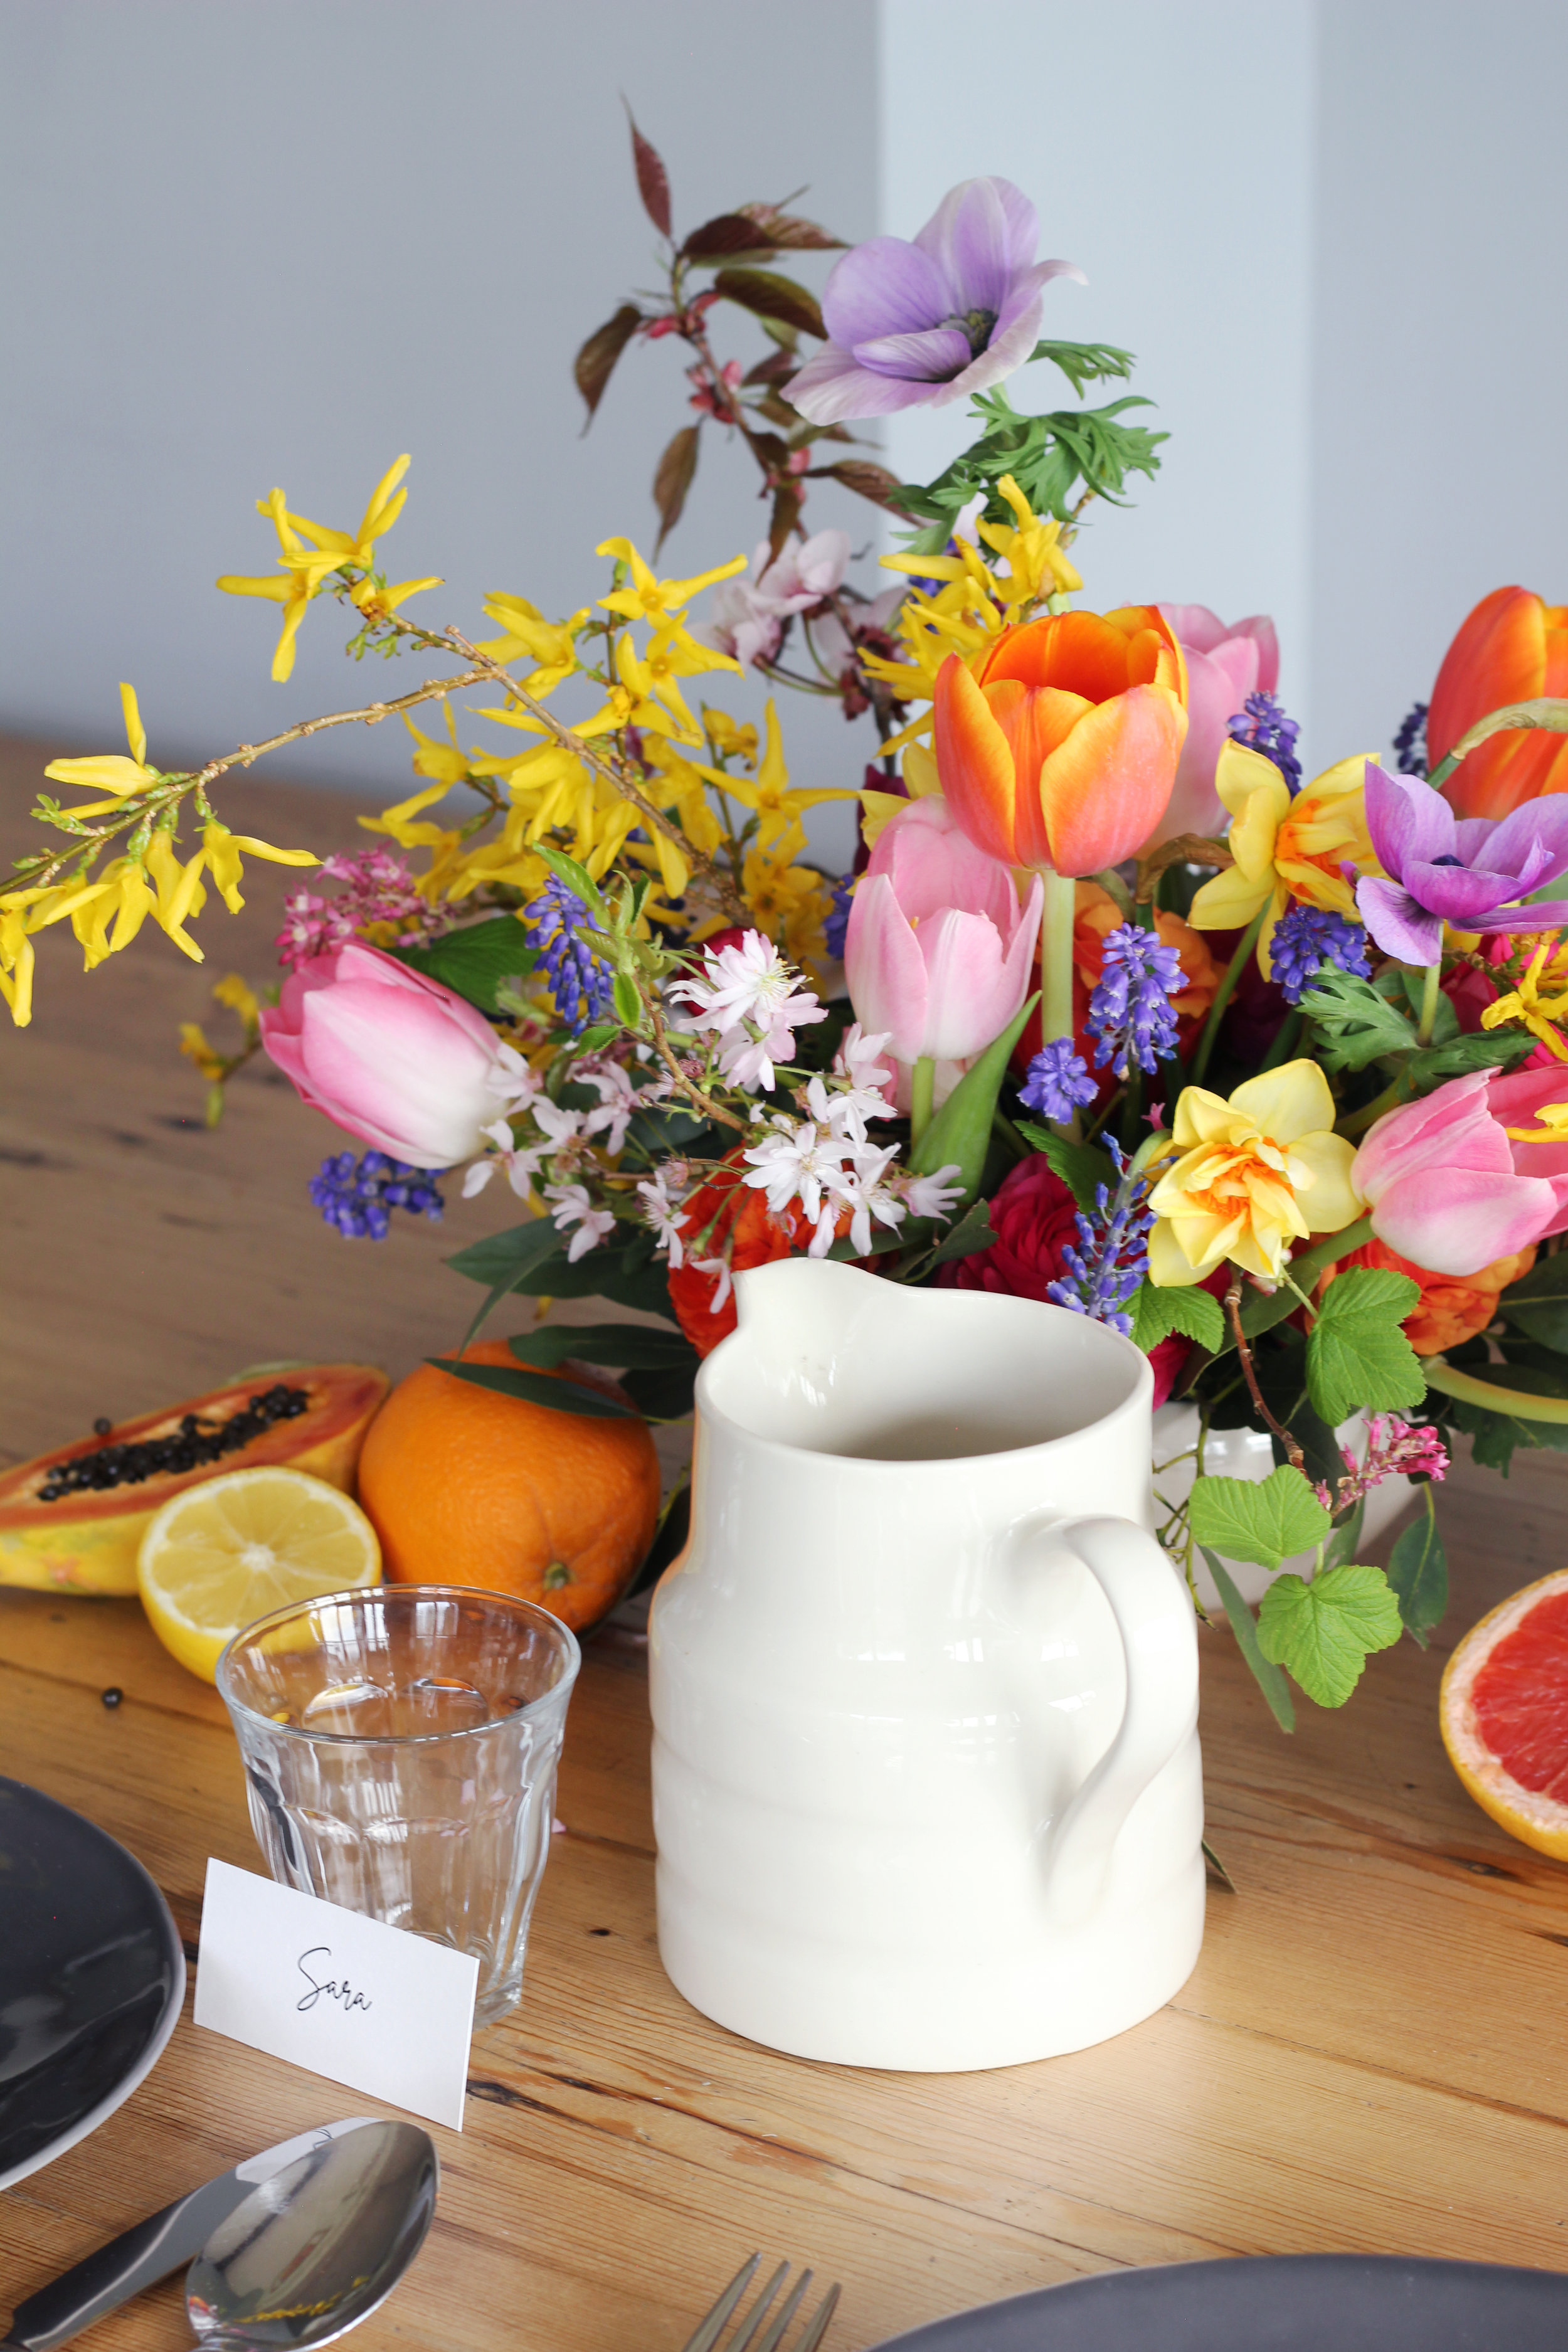 Callie-Pettigrew-Fruity-Florals-12.jpg